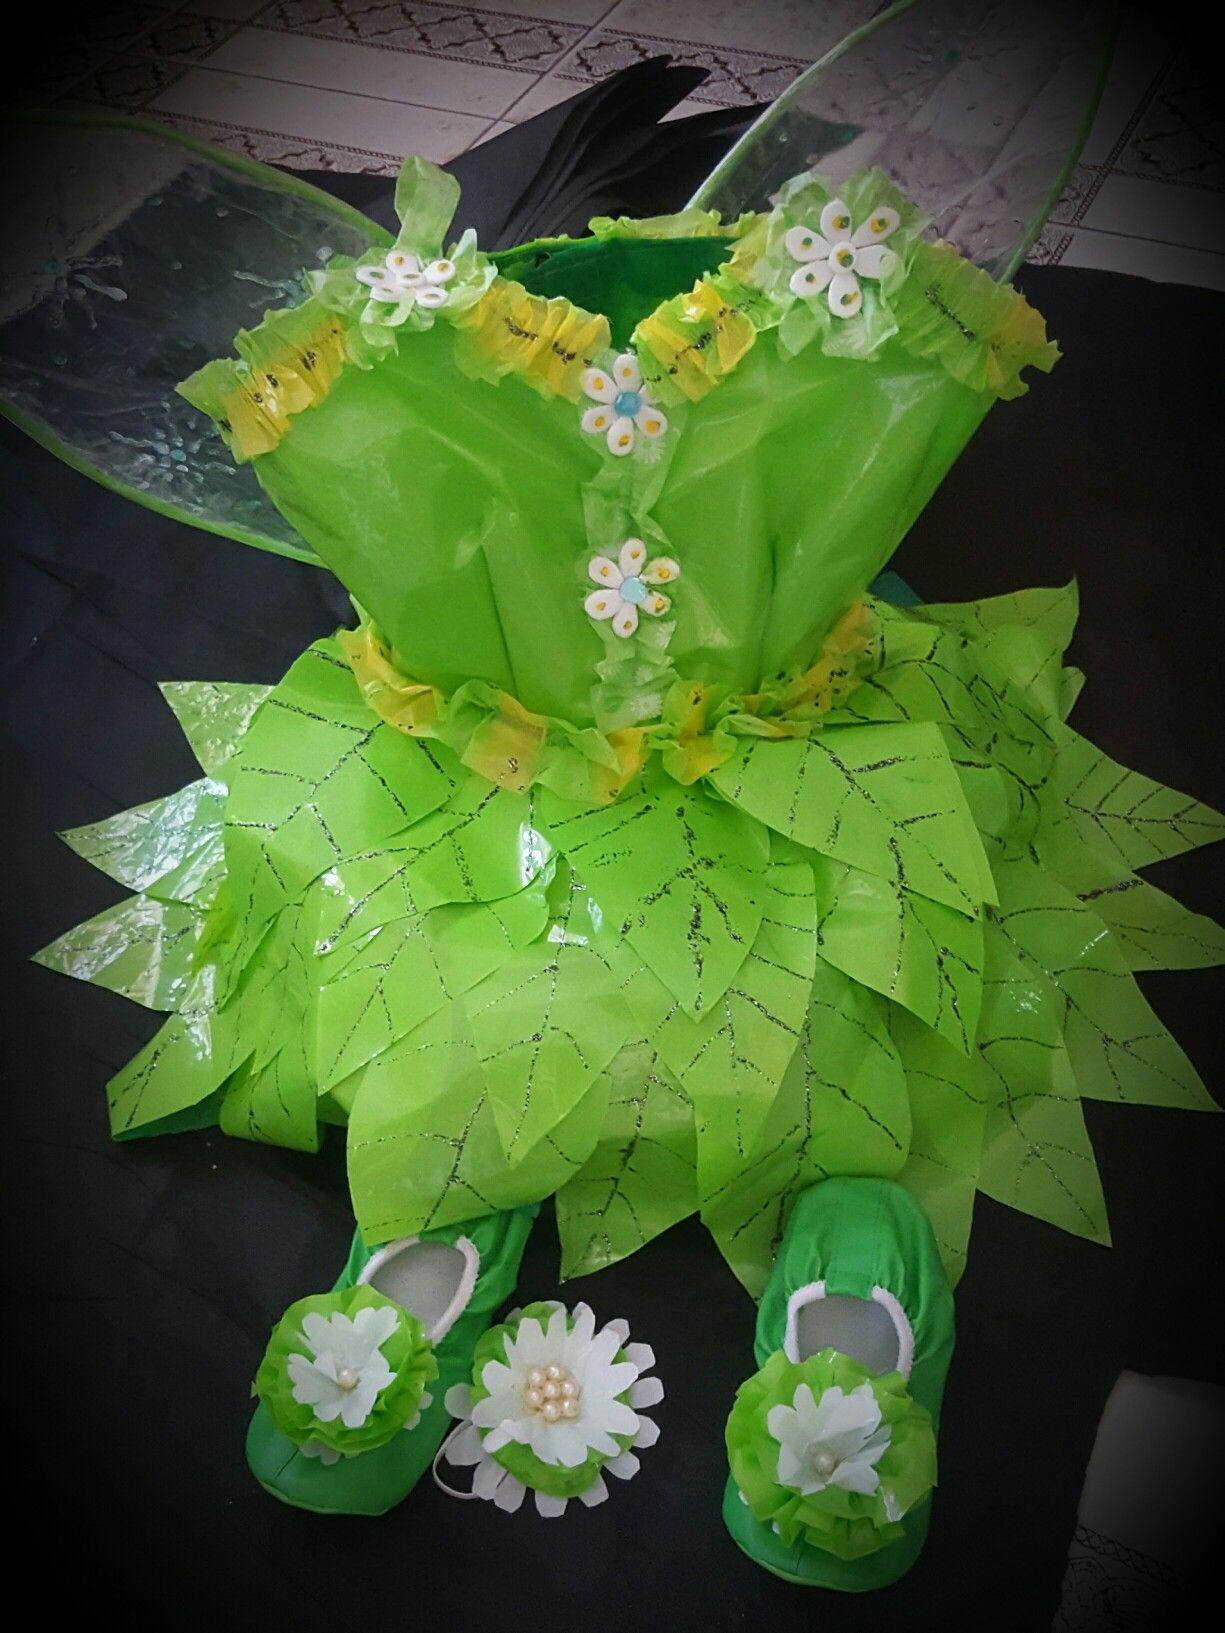 Disfraz con material reciclado de #tinkerbell   tinkerbell   Pinterest